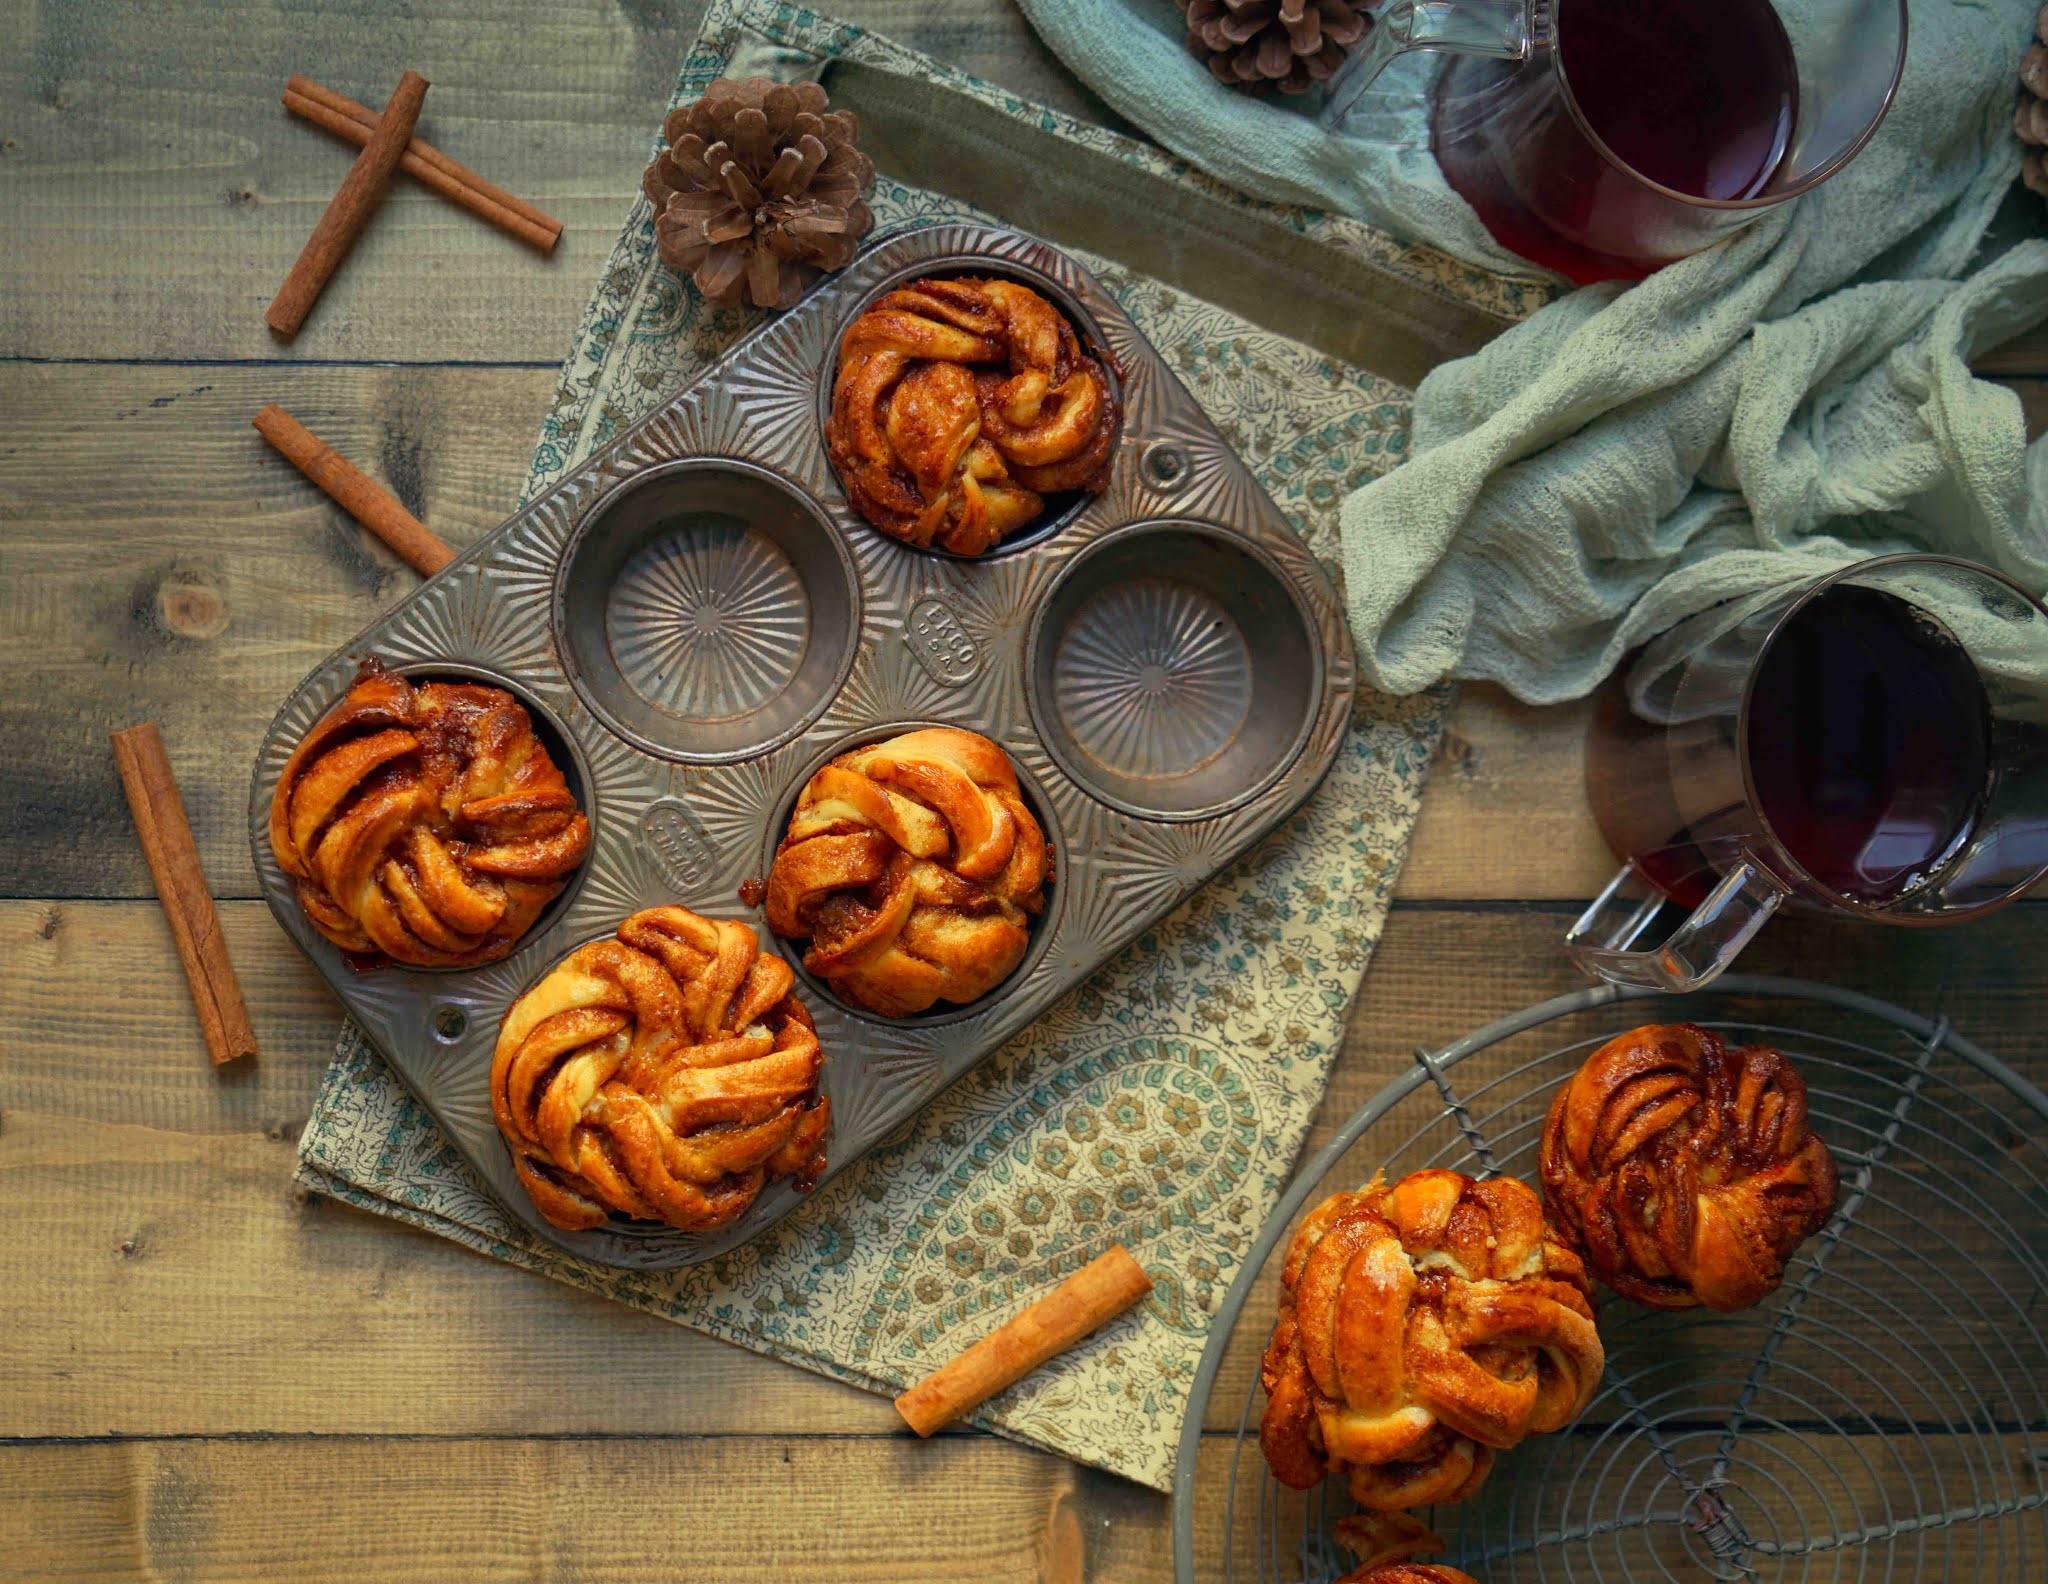 recette scandinave , brioches danoises